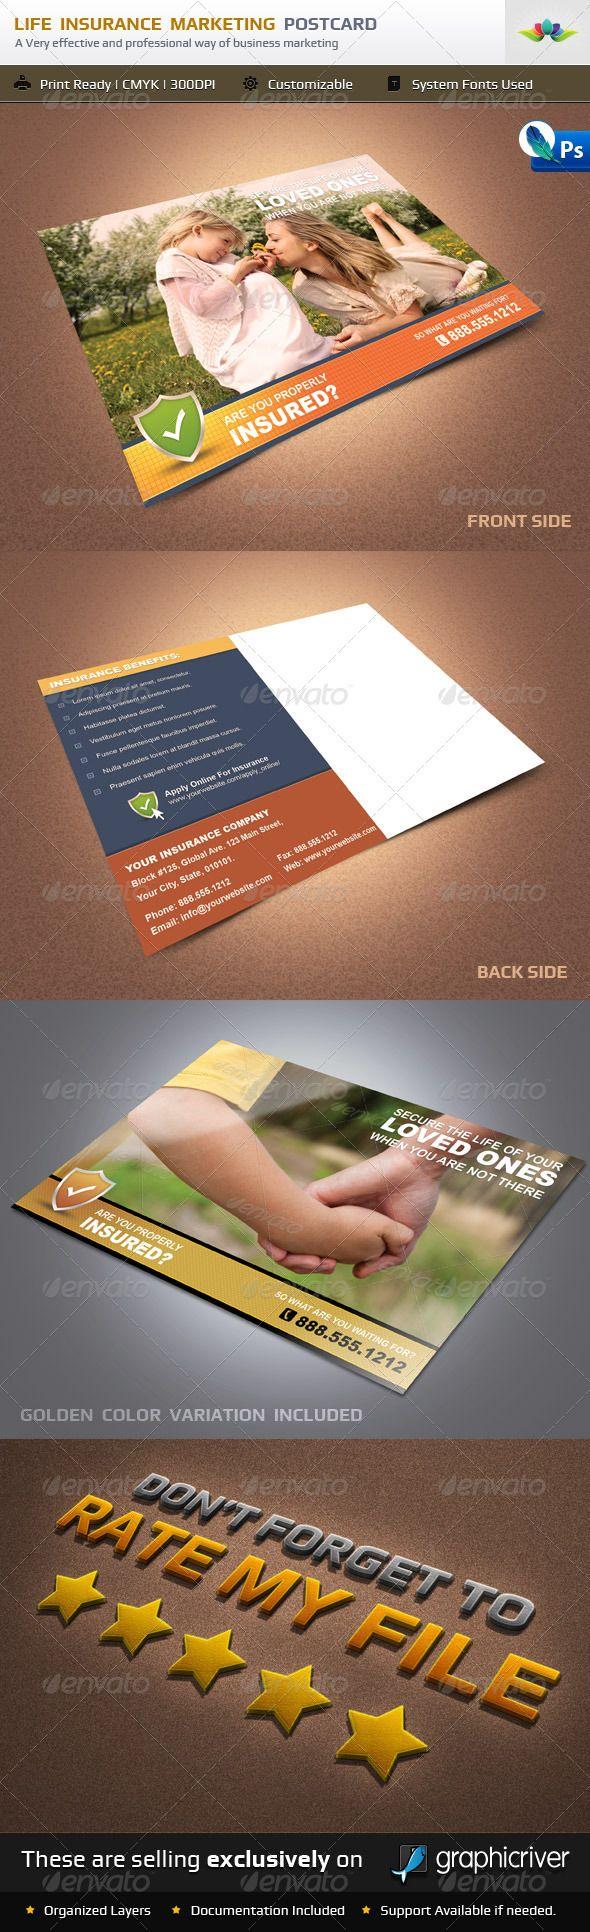 Life Insurance Marketing Postcard Life Insurance Marketing